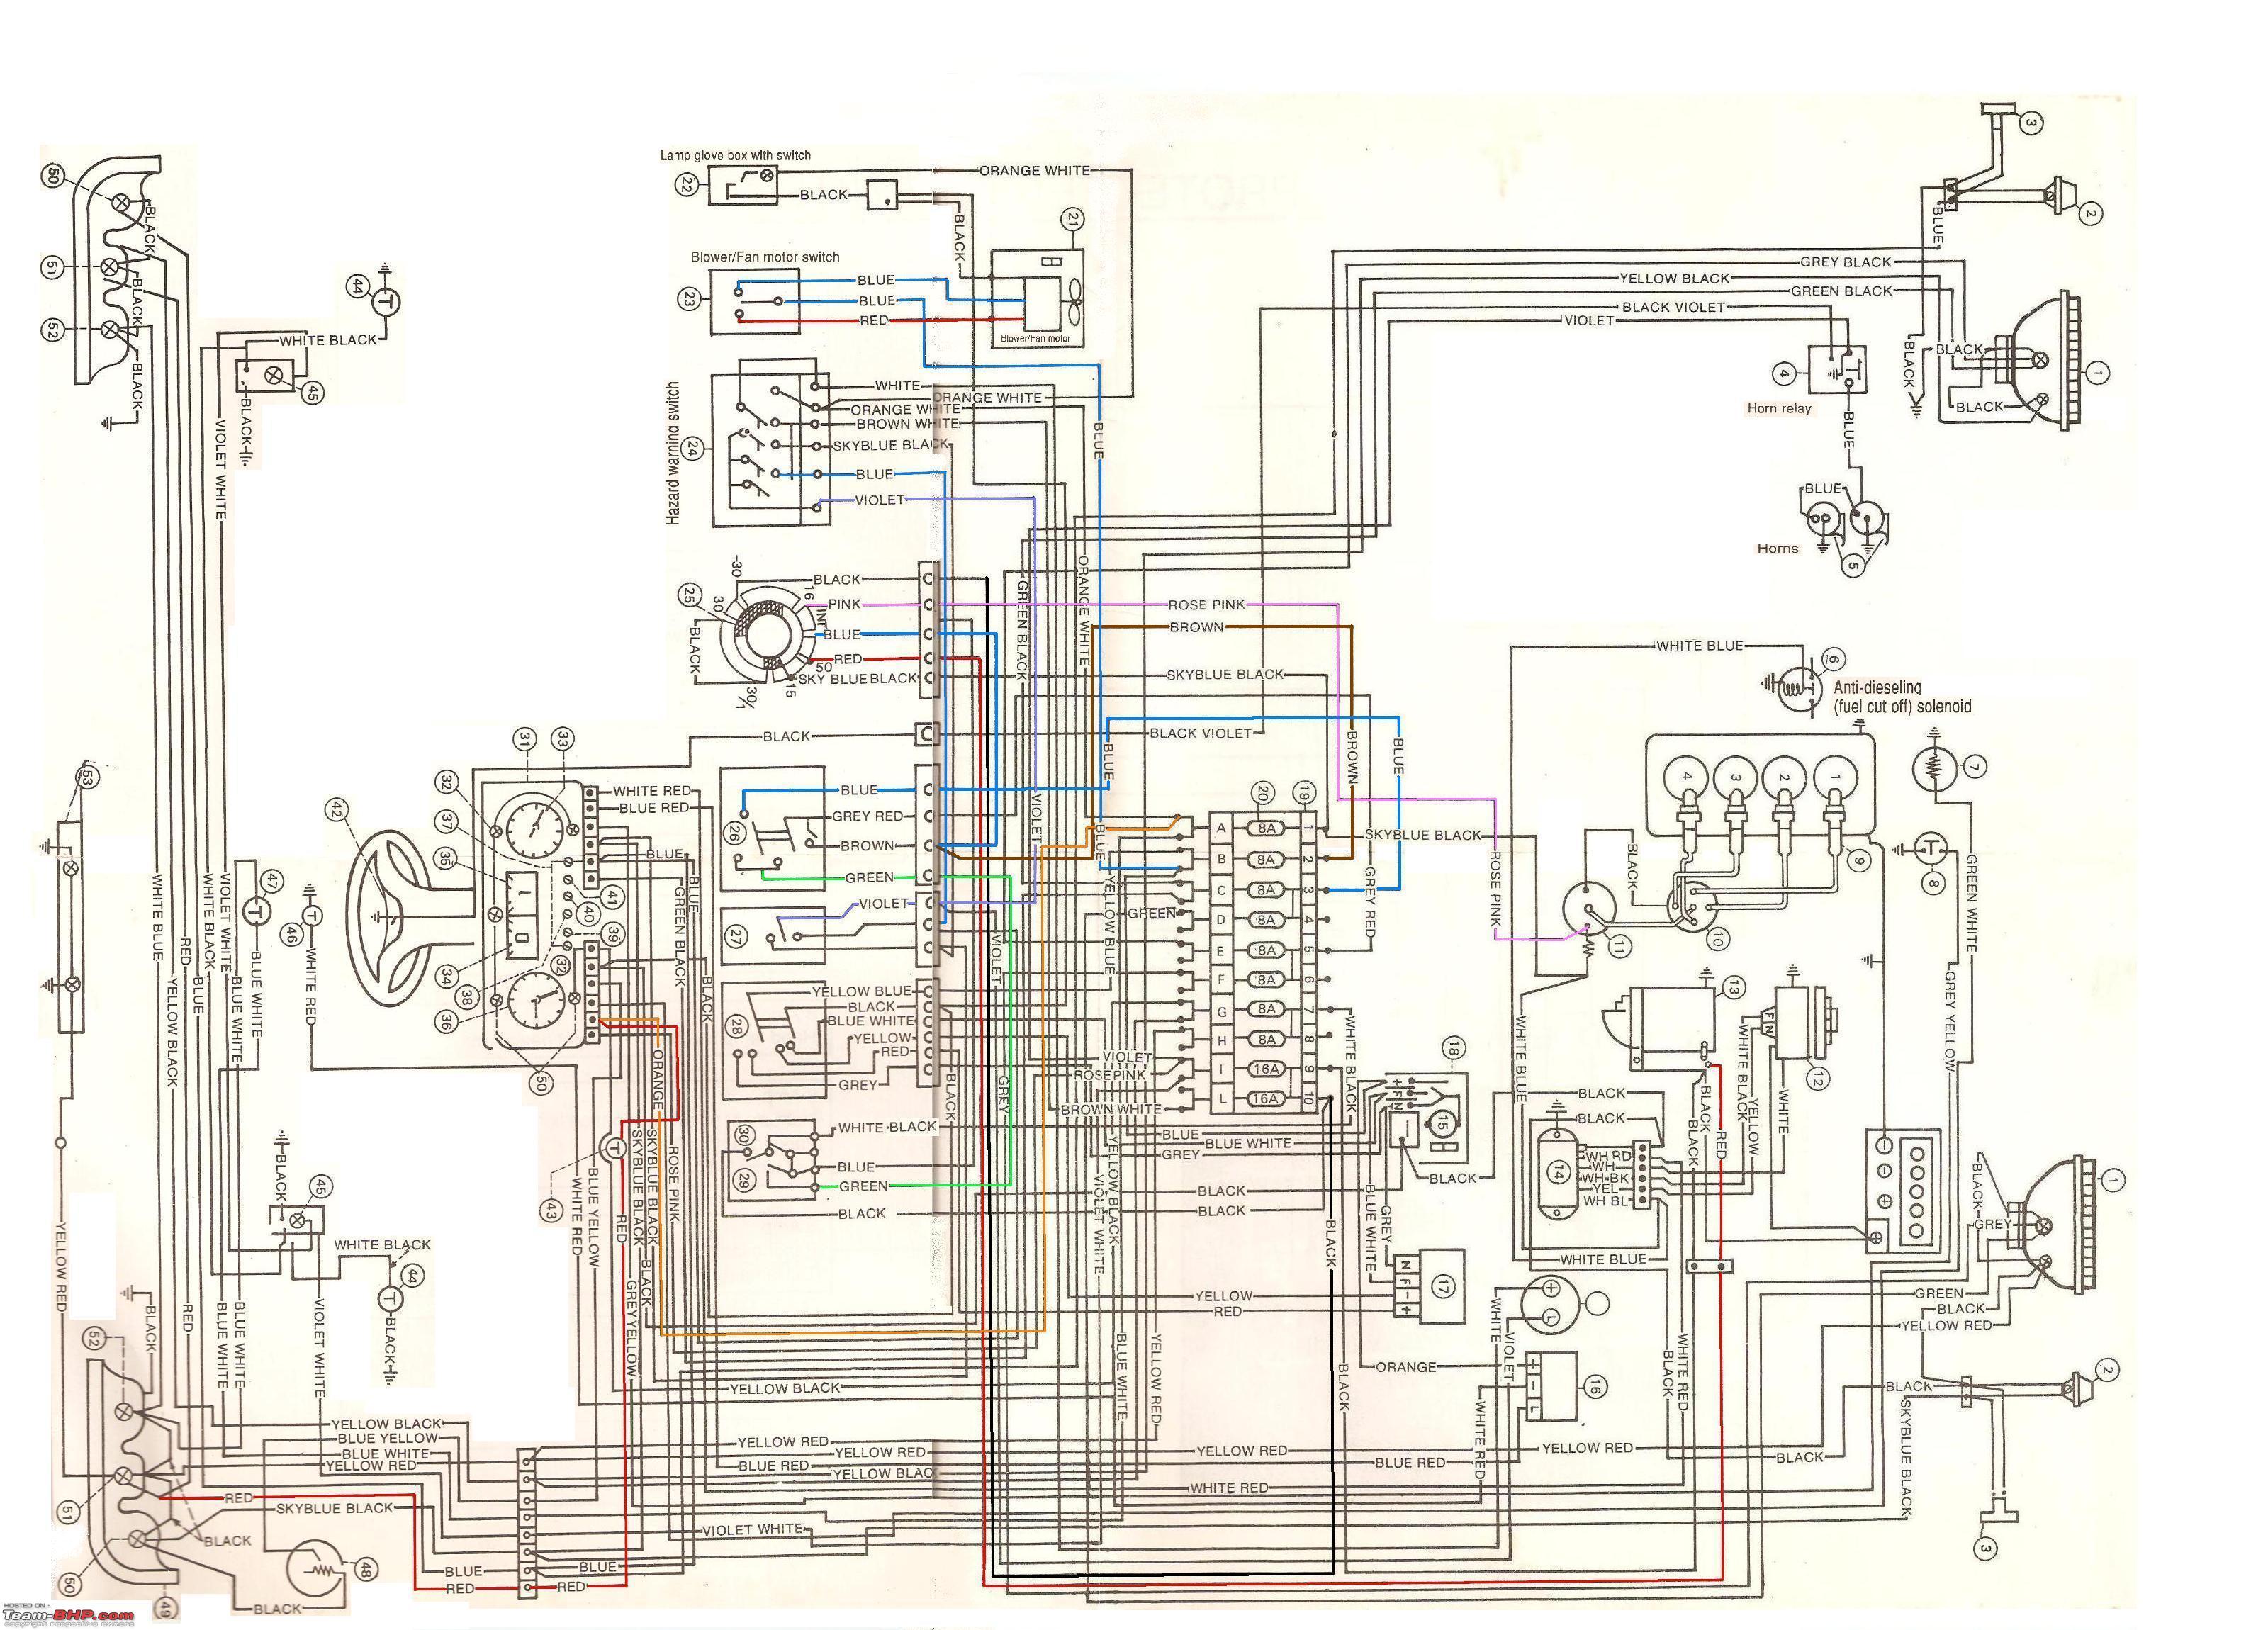 Suzuki Alto Engine Wiring Diagram Modern Design Of Saab 9 3 Ecu Data Rh 42 Hrc Solarhandel De Harness